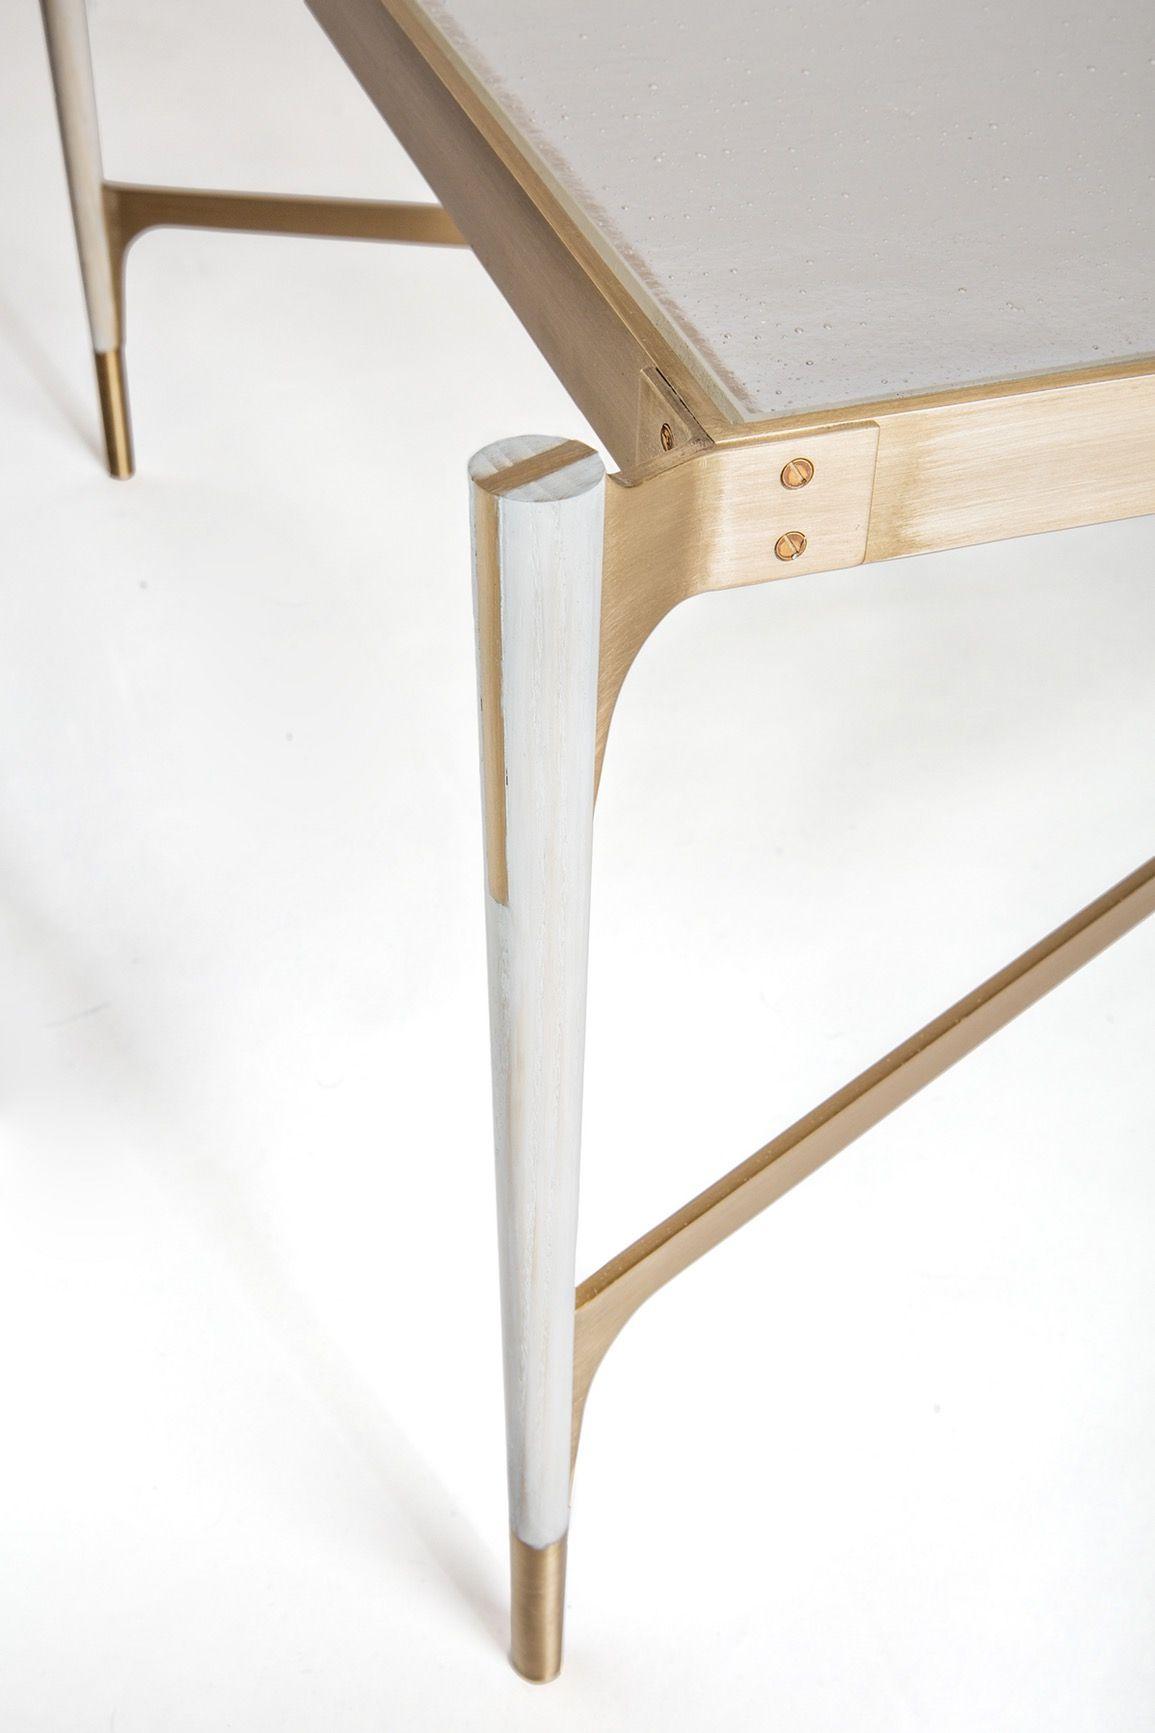 Buy STITES RECTANGULAR COCKTAIL TABLE By John Pomp   Made To Order Designer  Furniture